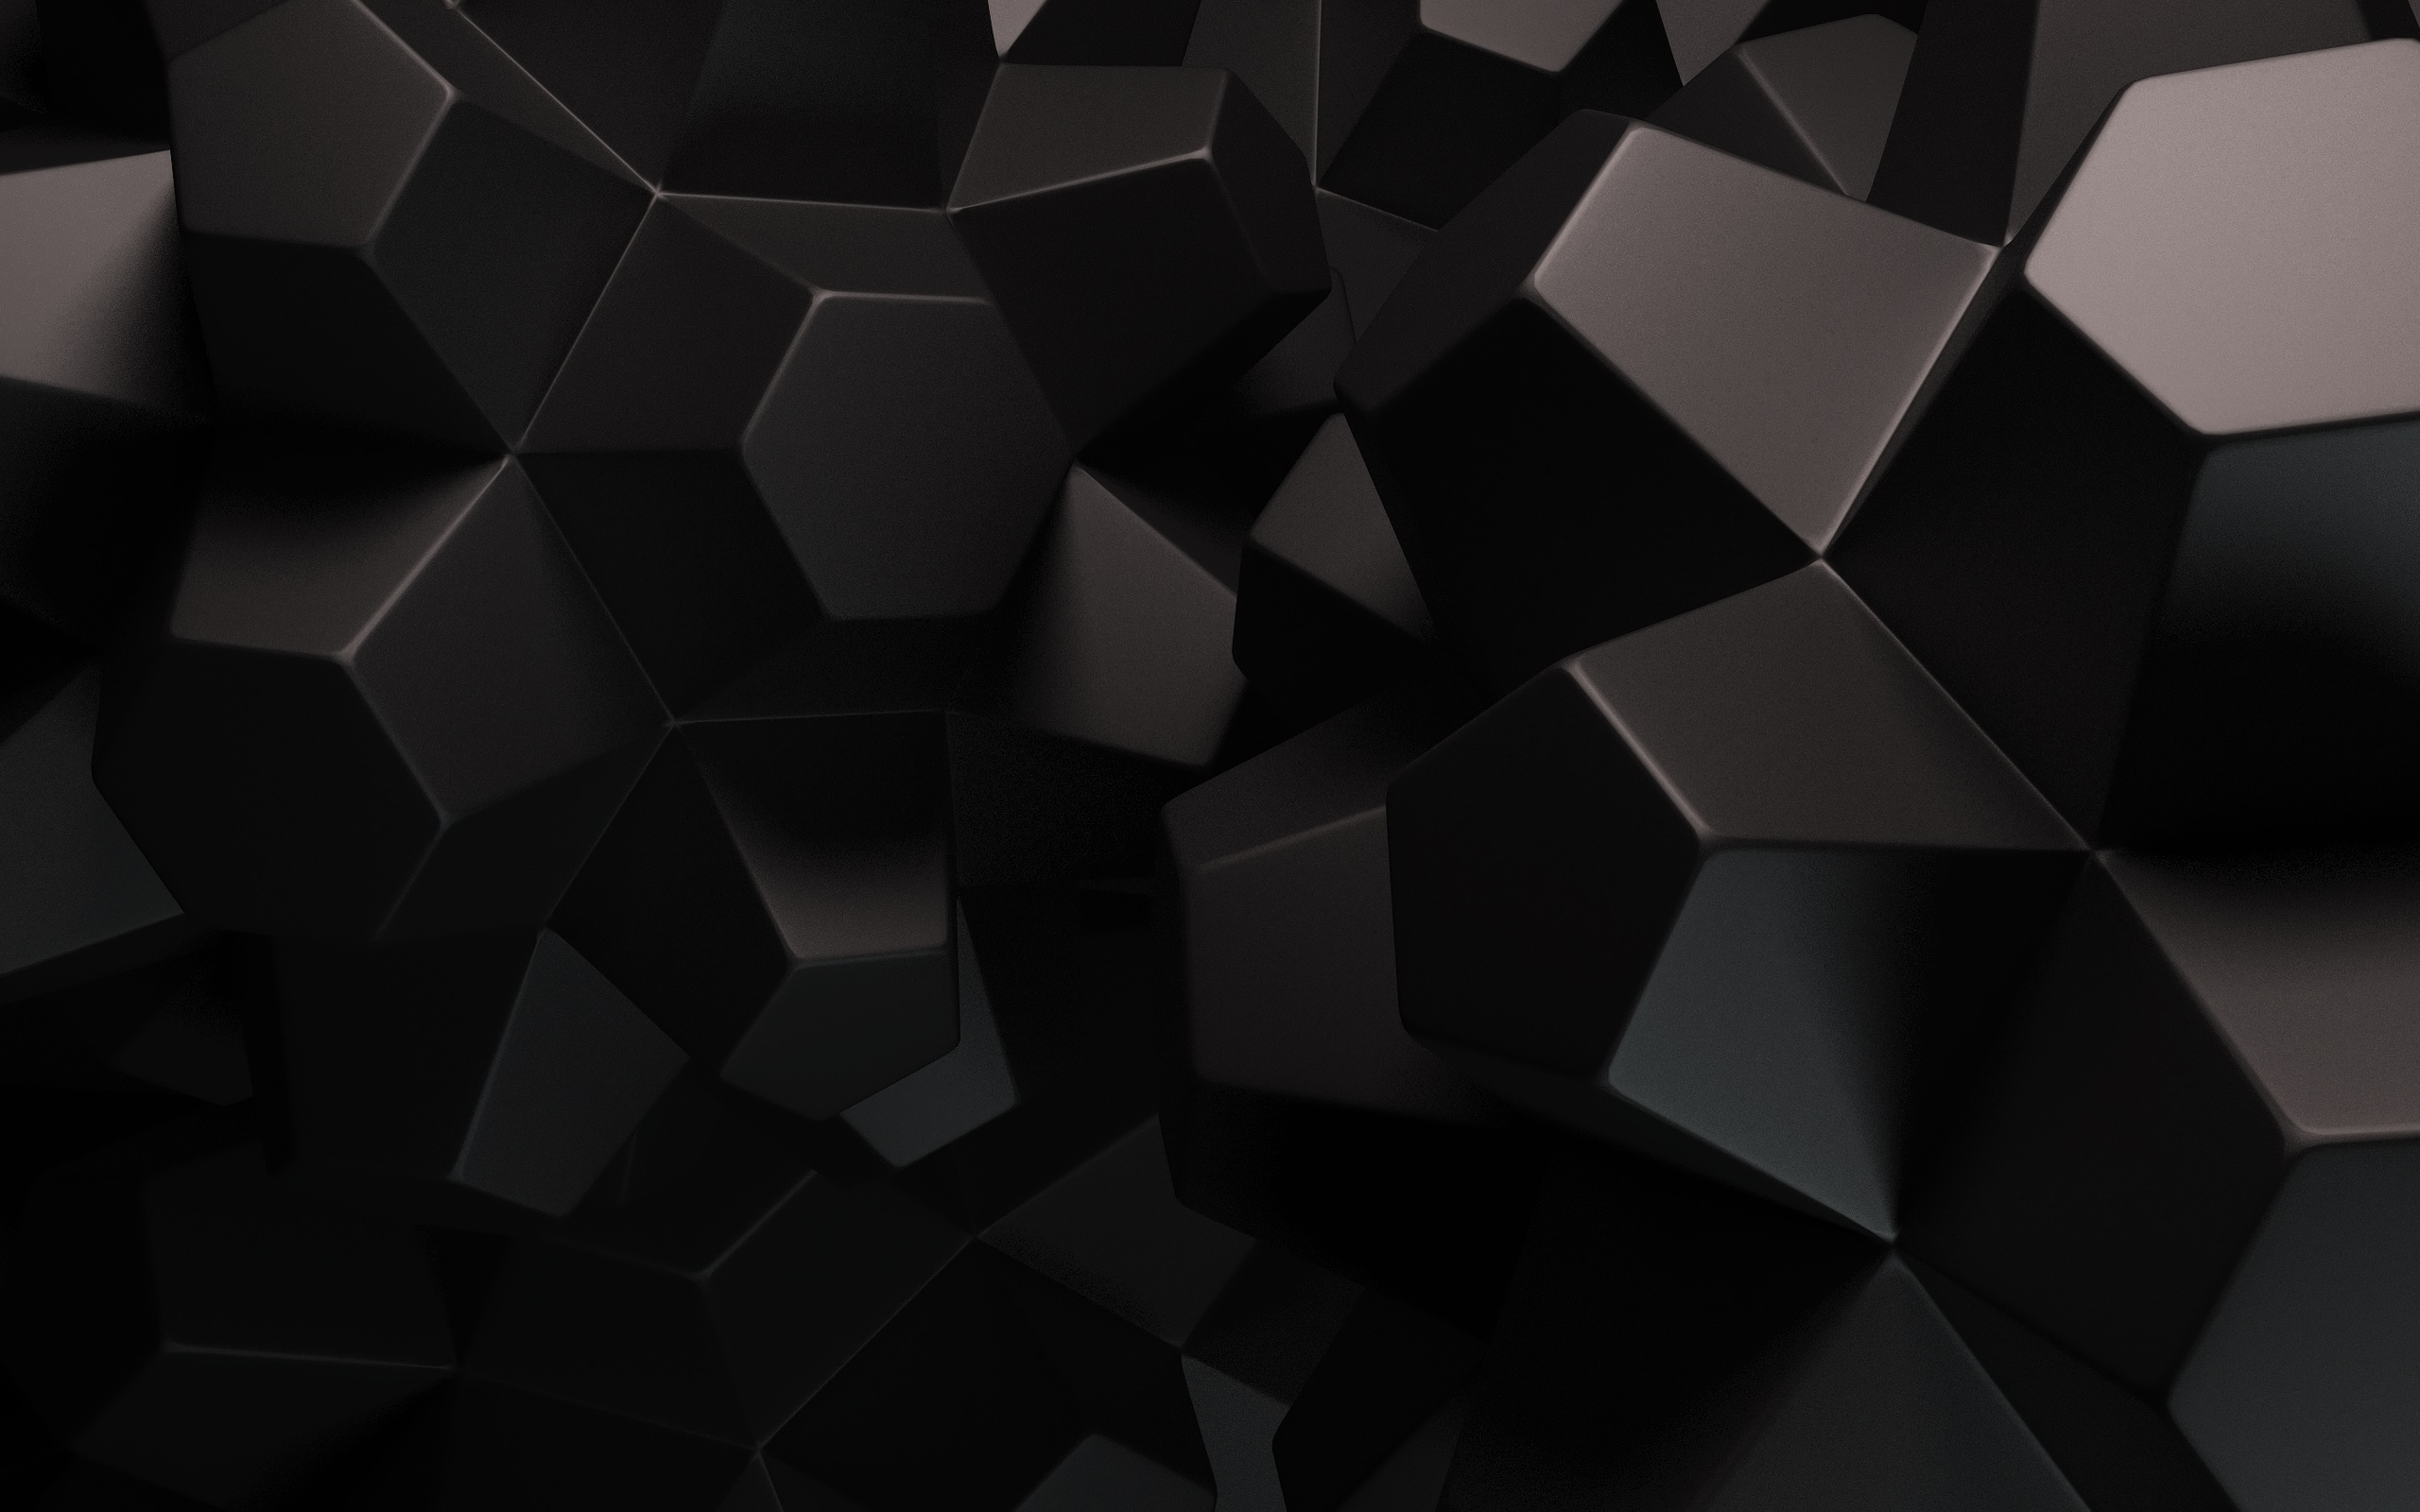 2560x1600 Abstract Black Shapes desktop PC and Mac wallpaper 2560x1600